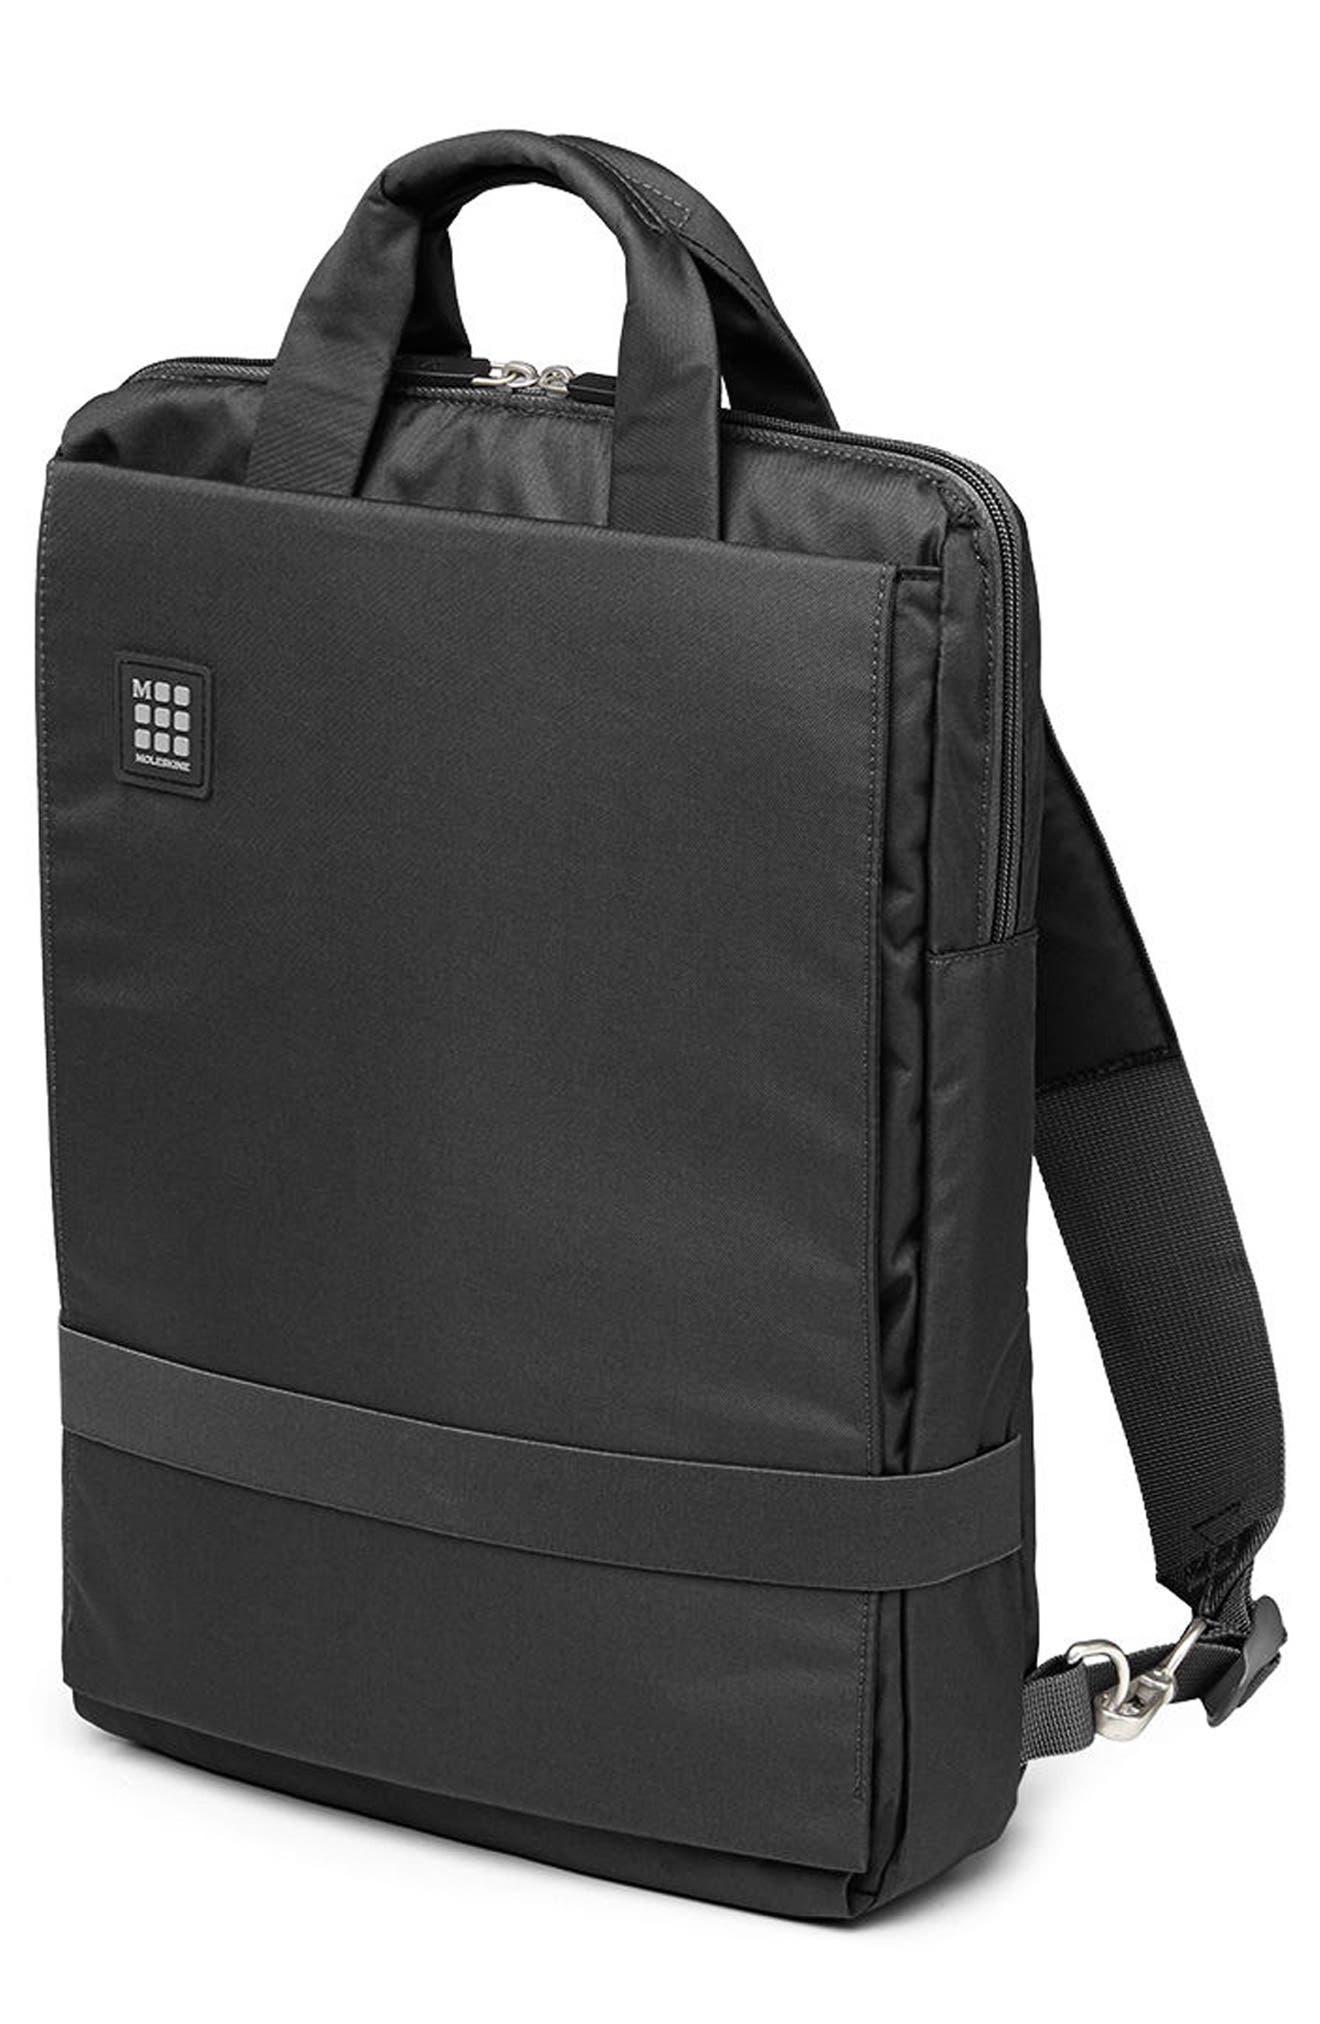 Vertical Device Bag,                         Main,                         color, 001